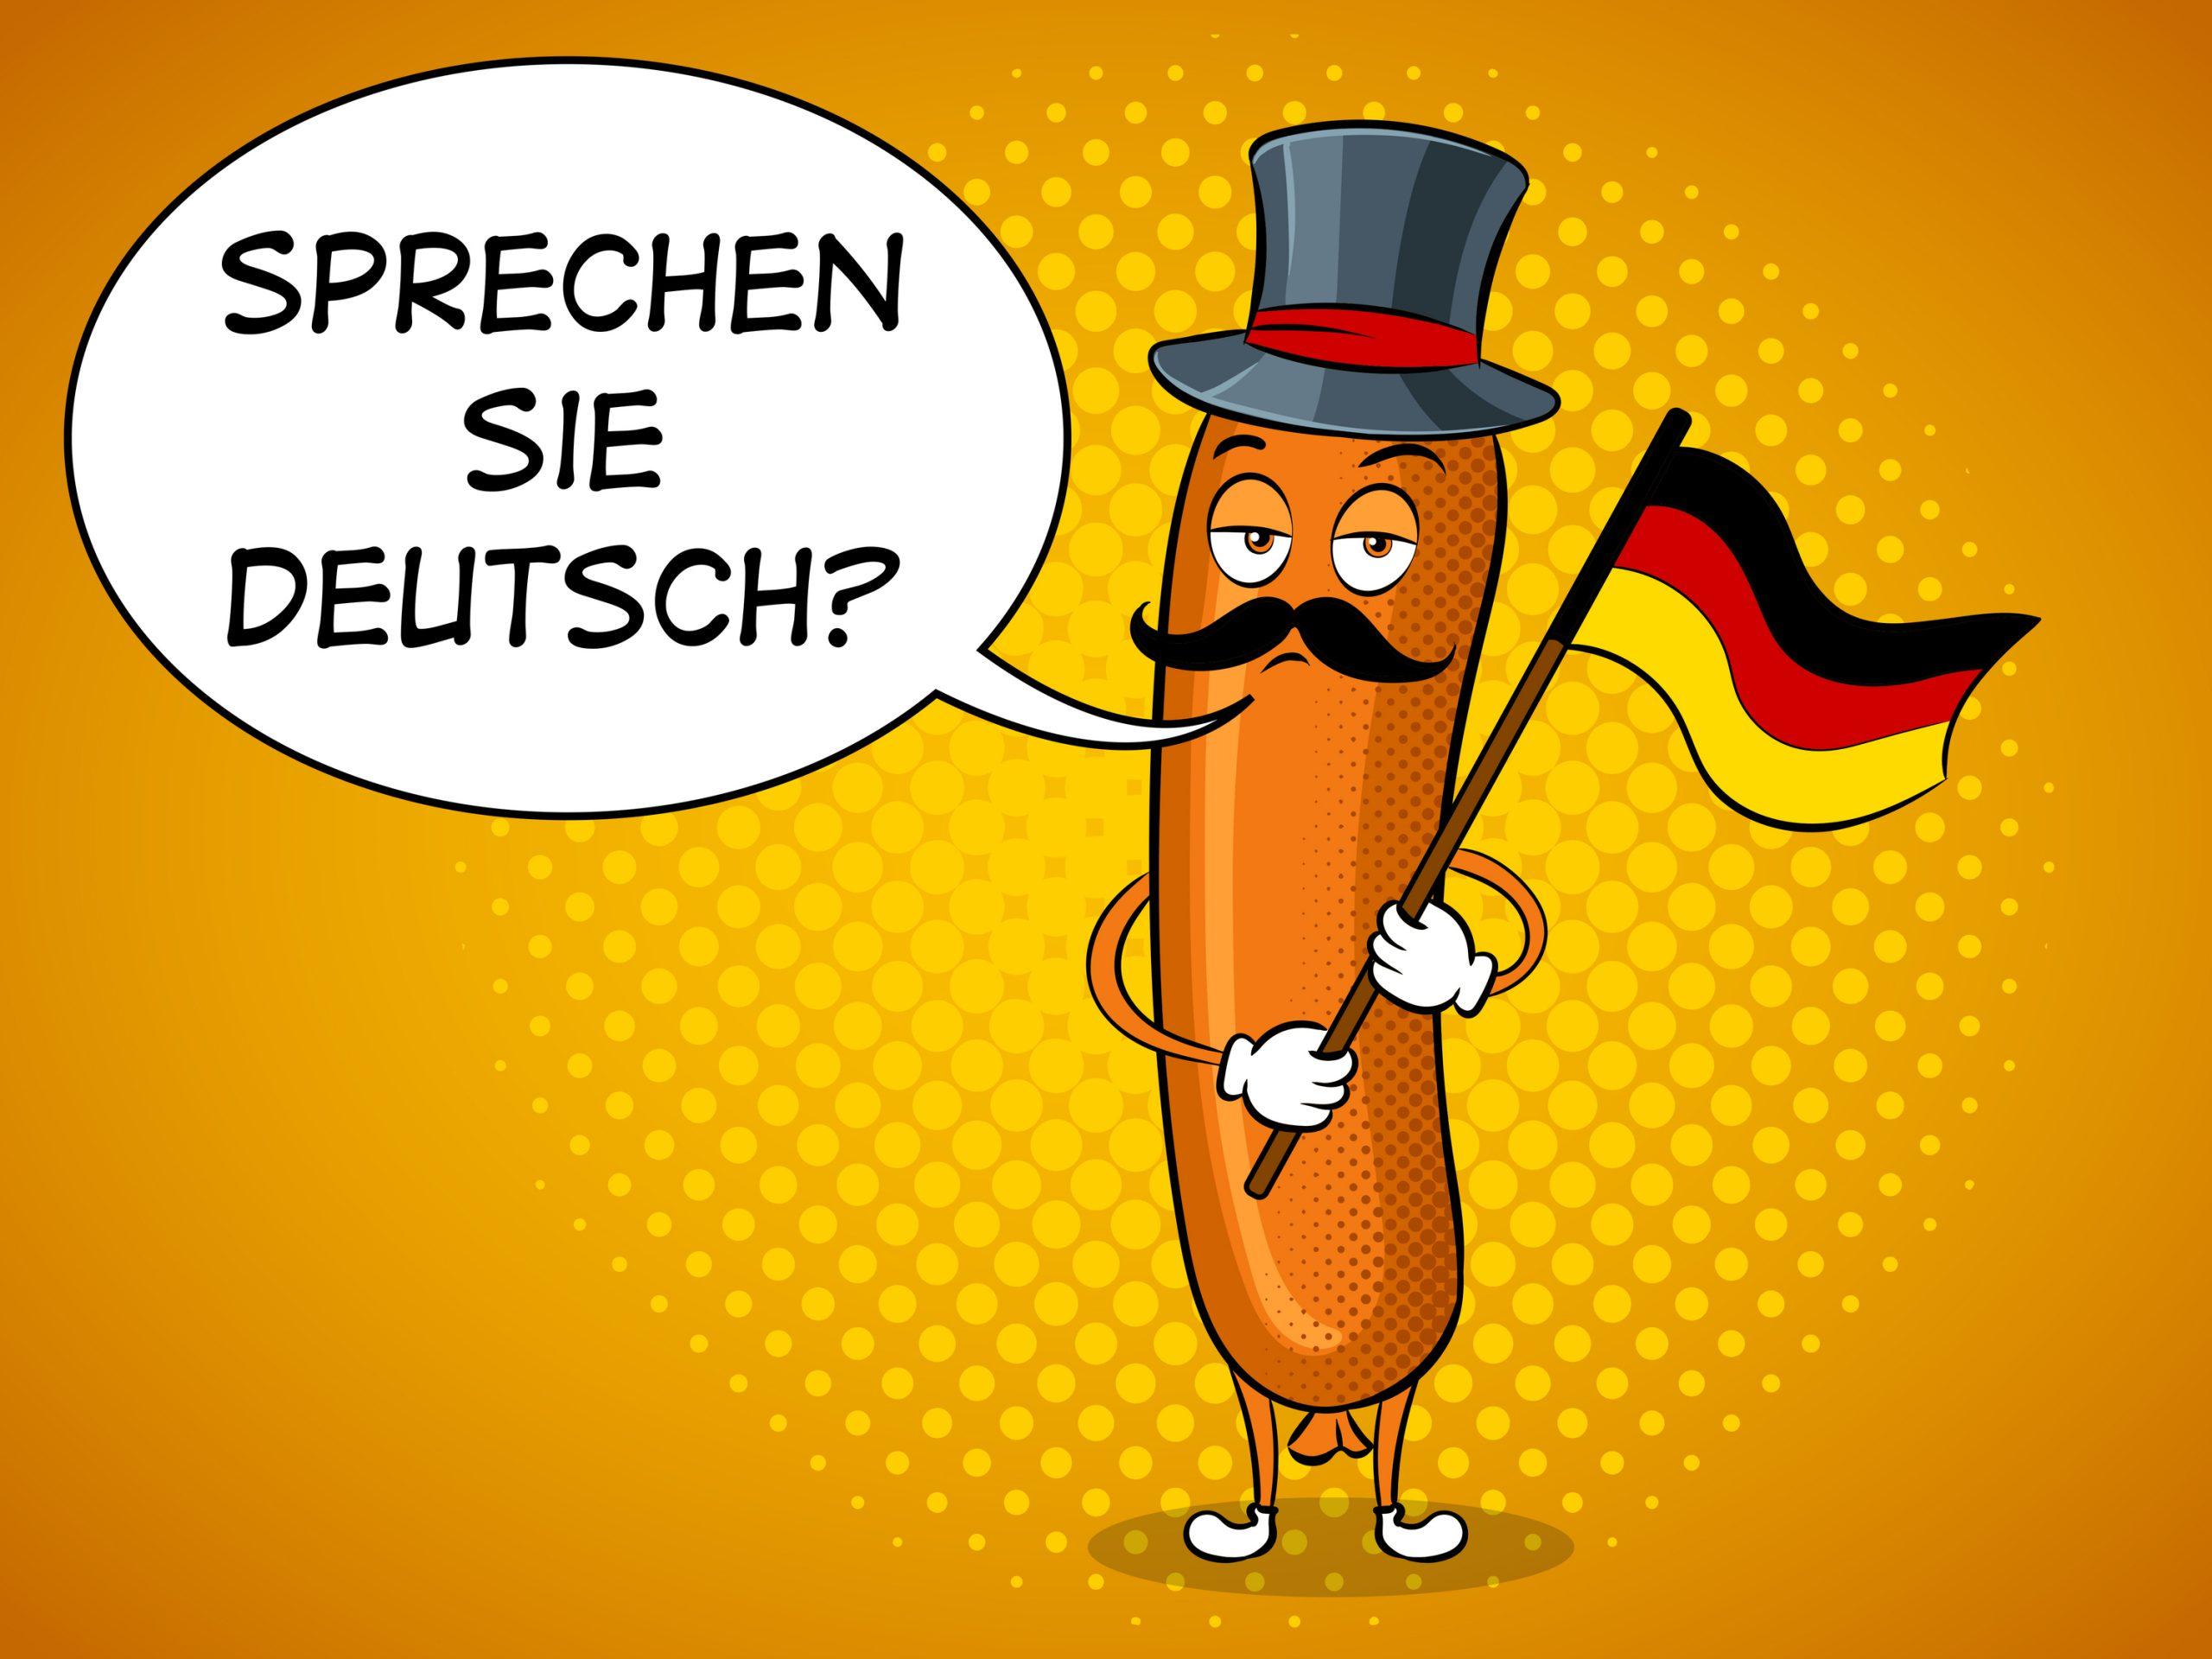 BS_Bavarian sausage_Germany_Alexnail_227471839